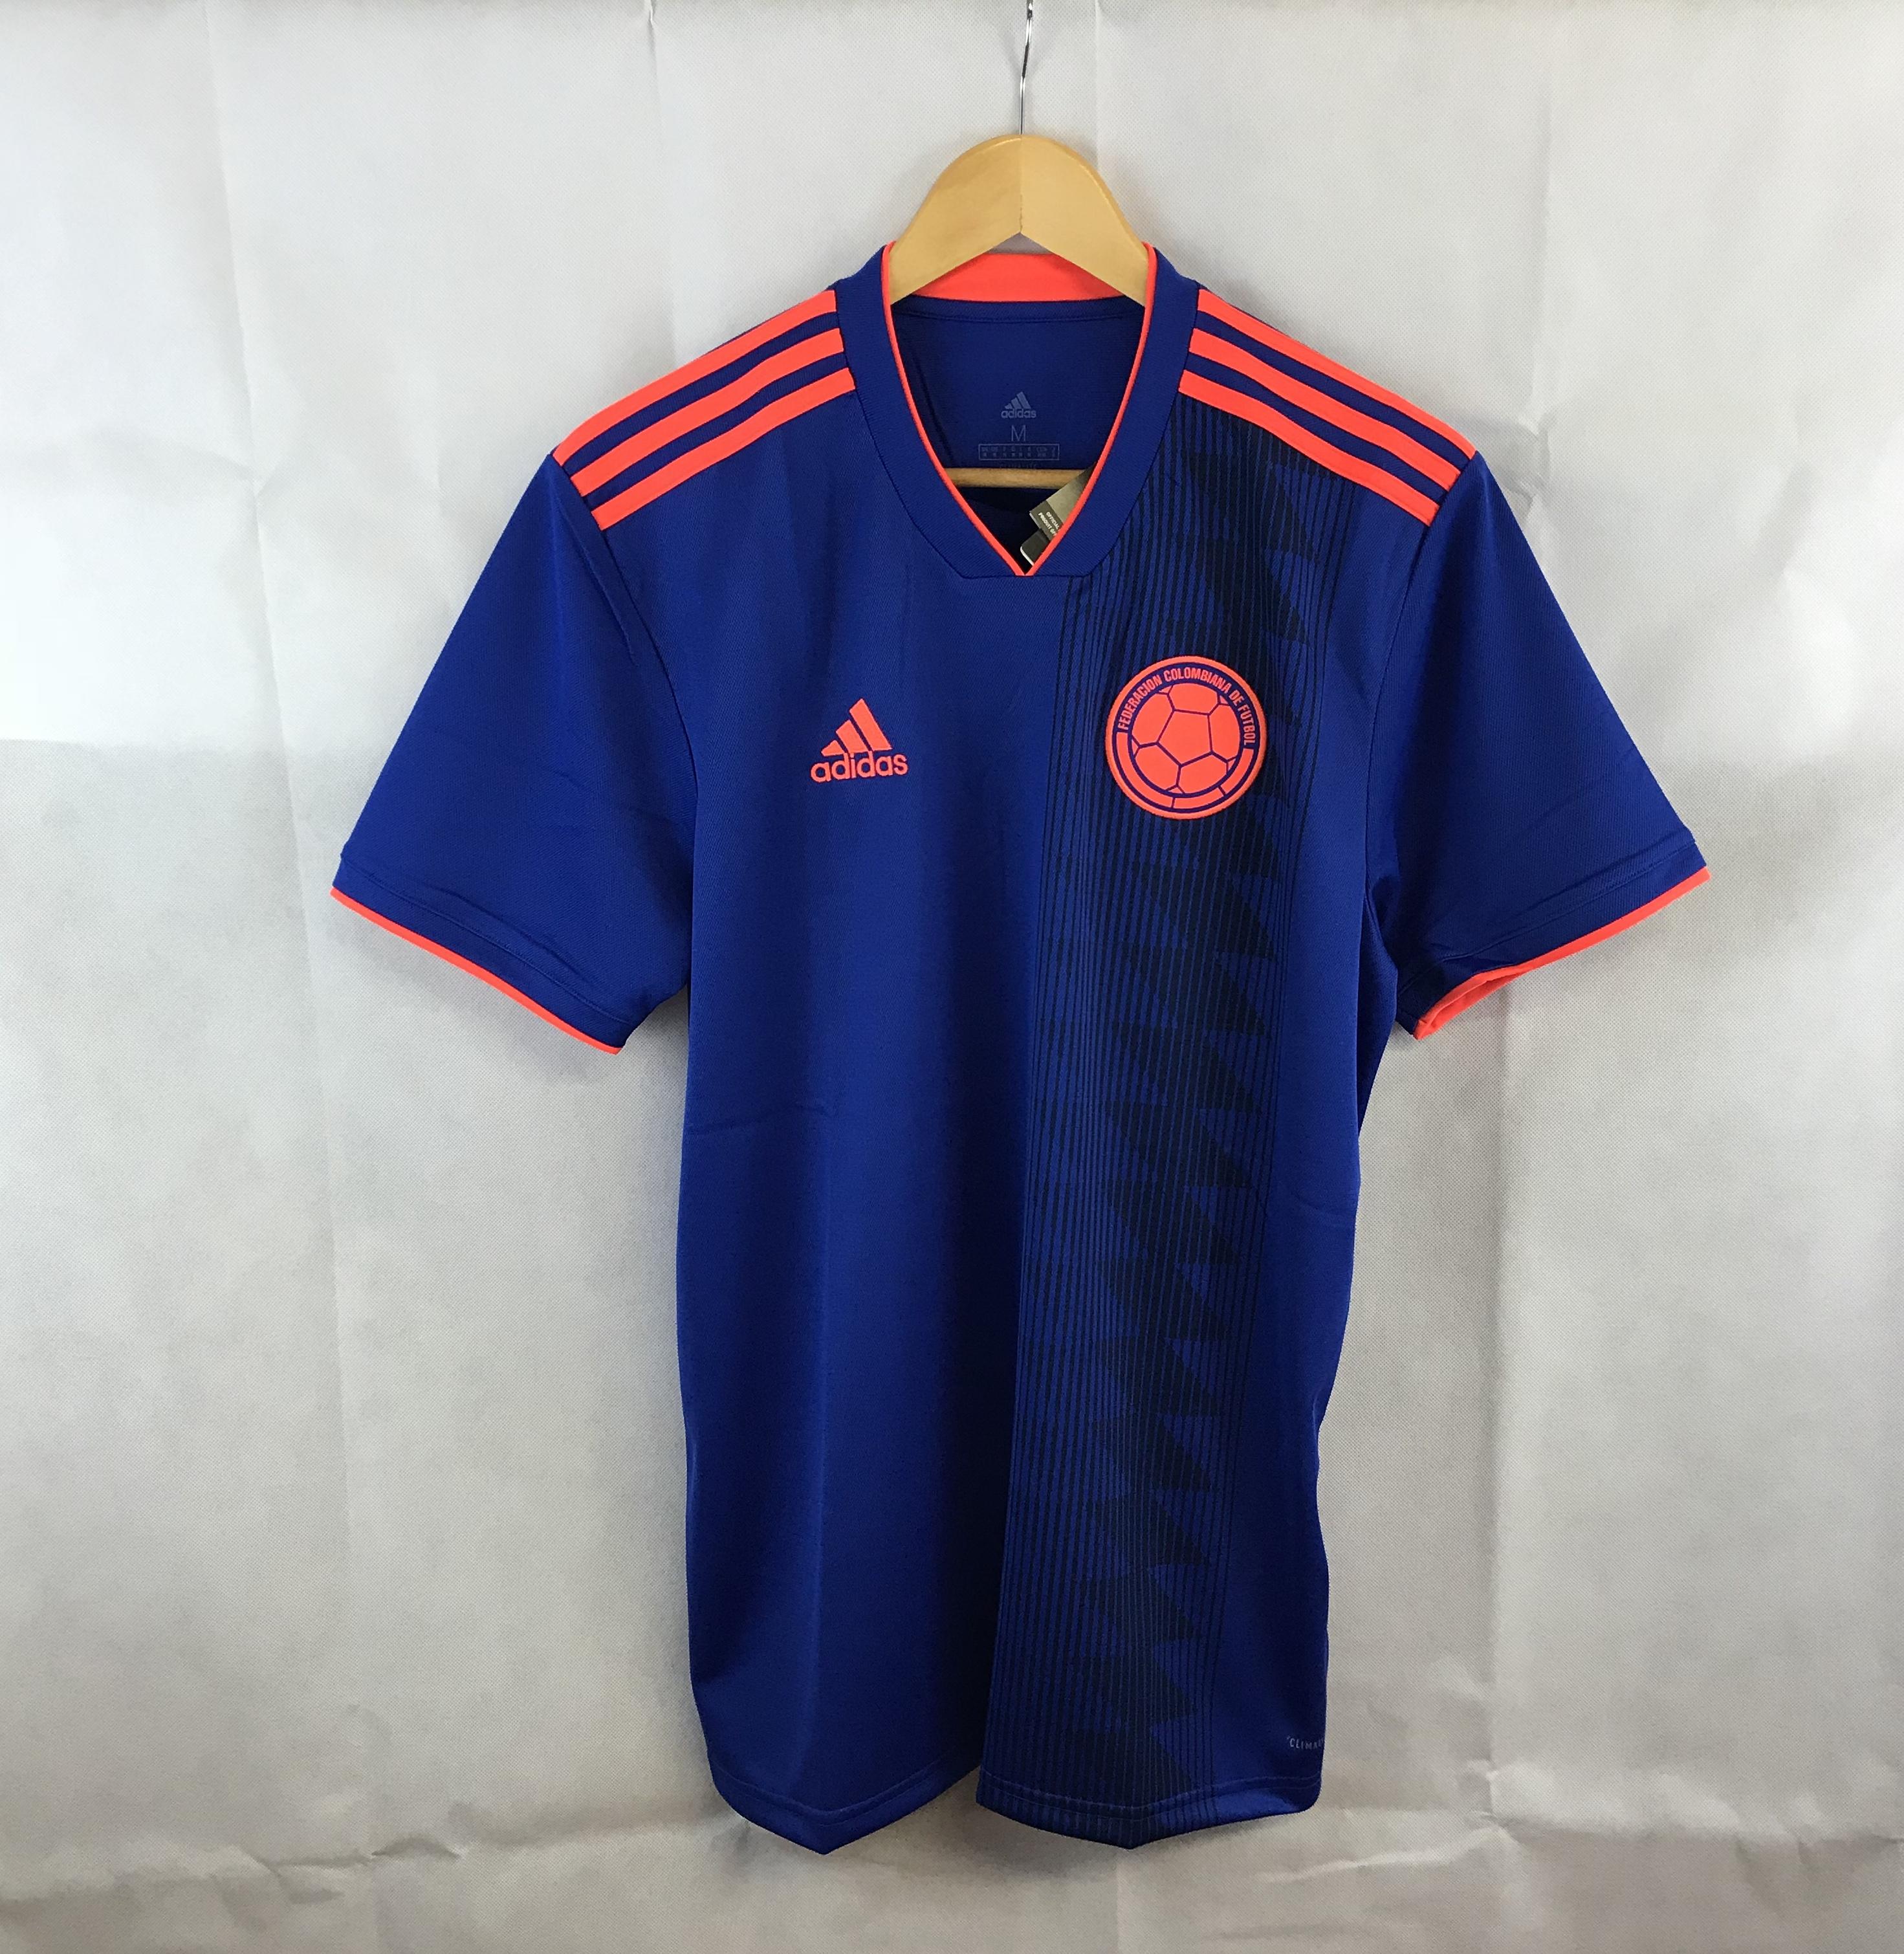 d24b85d9a85b1 Colombia Away Football Shirt 2018/19 Adults Small Adidas